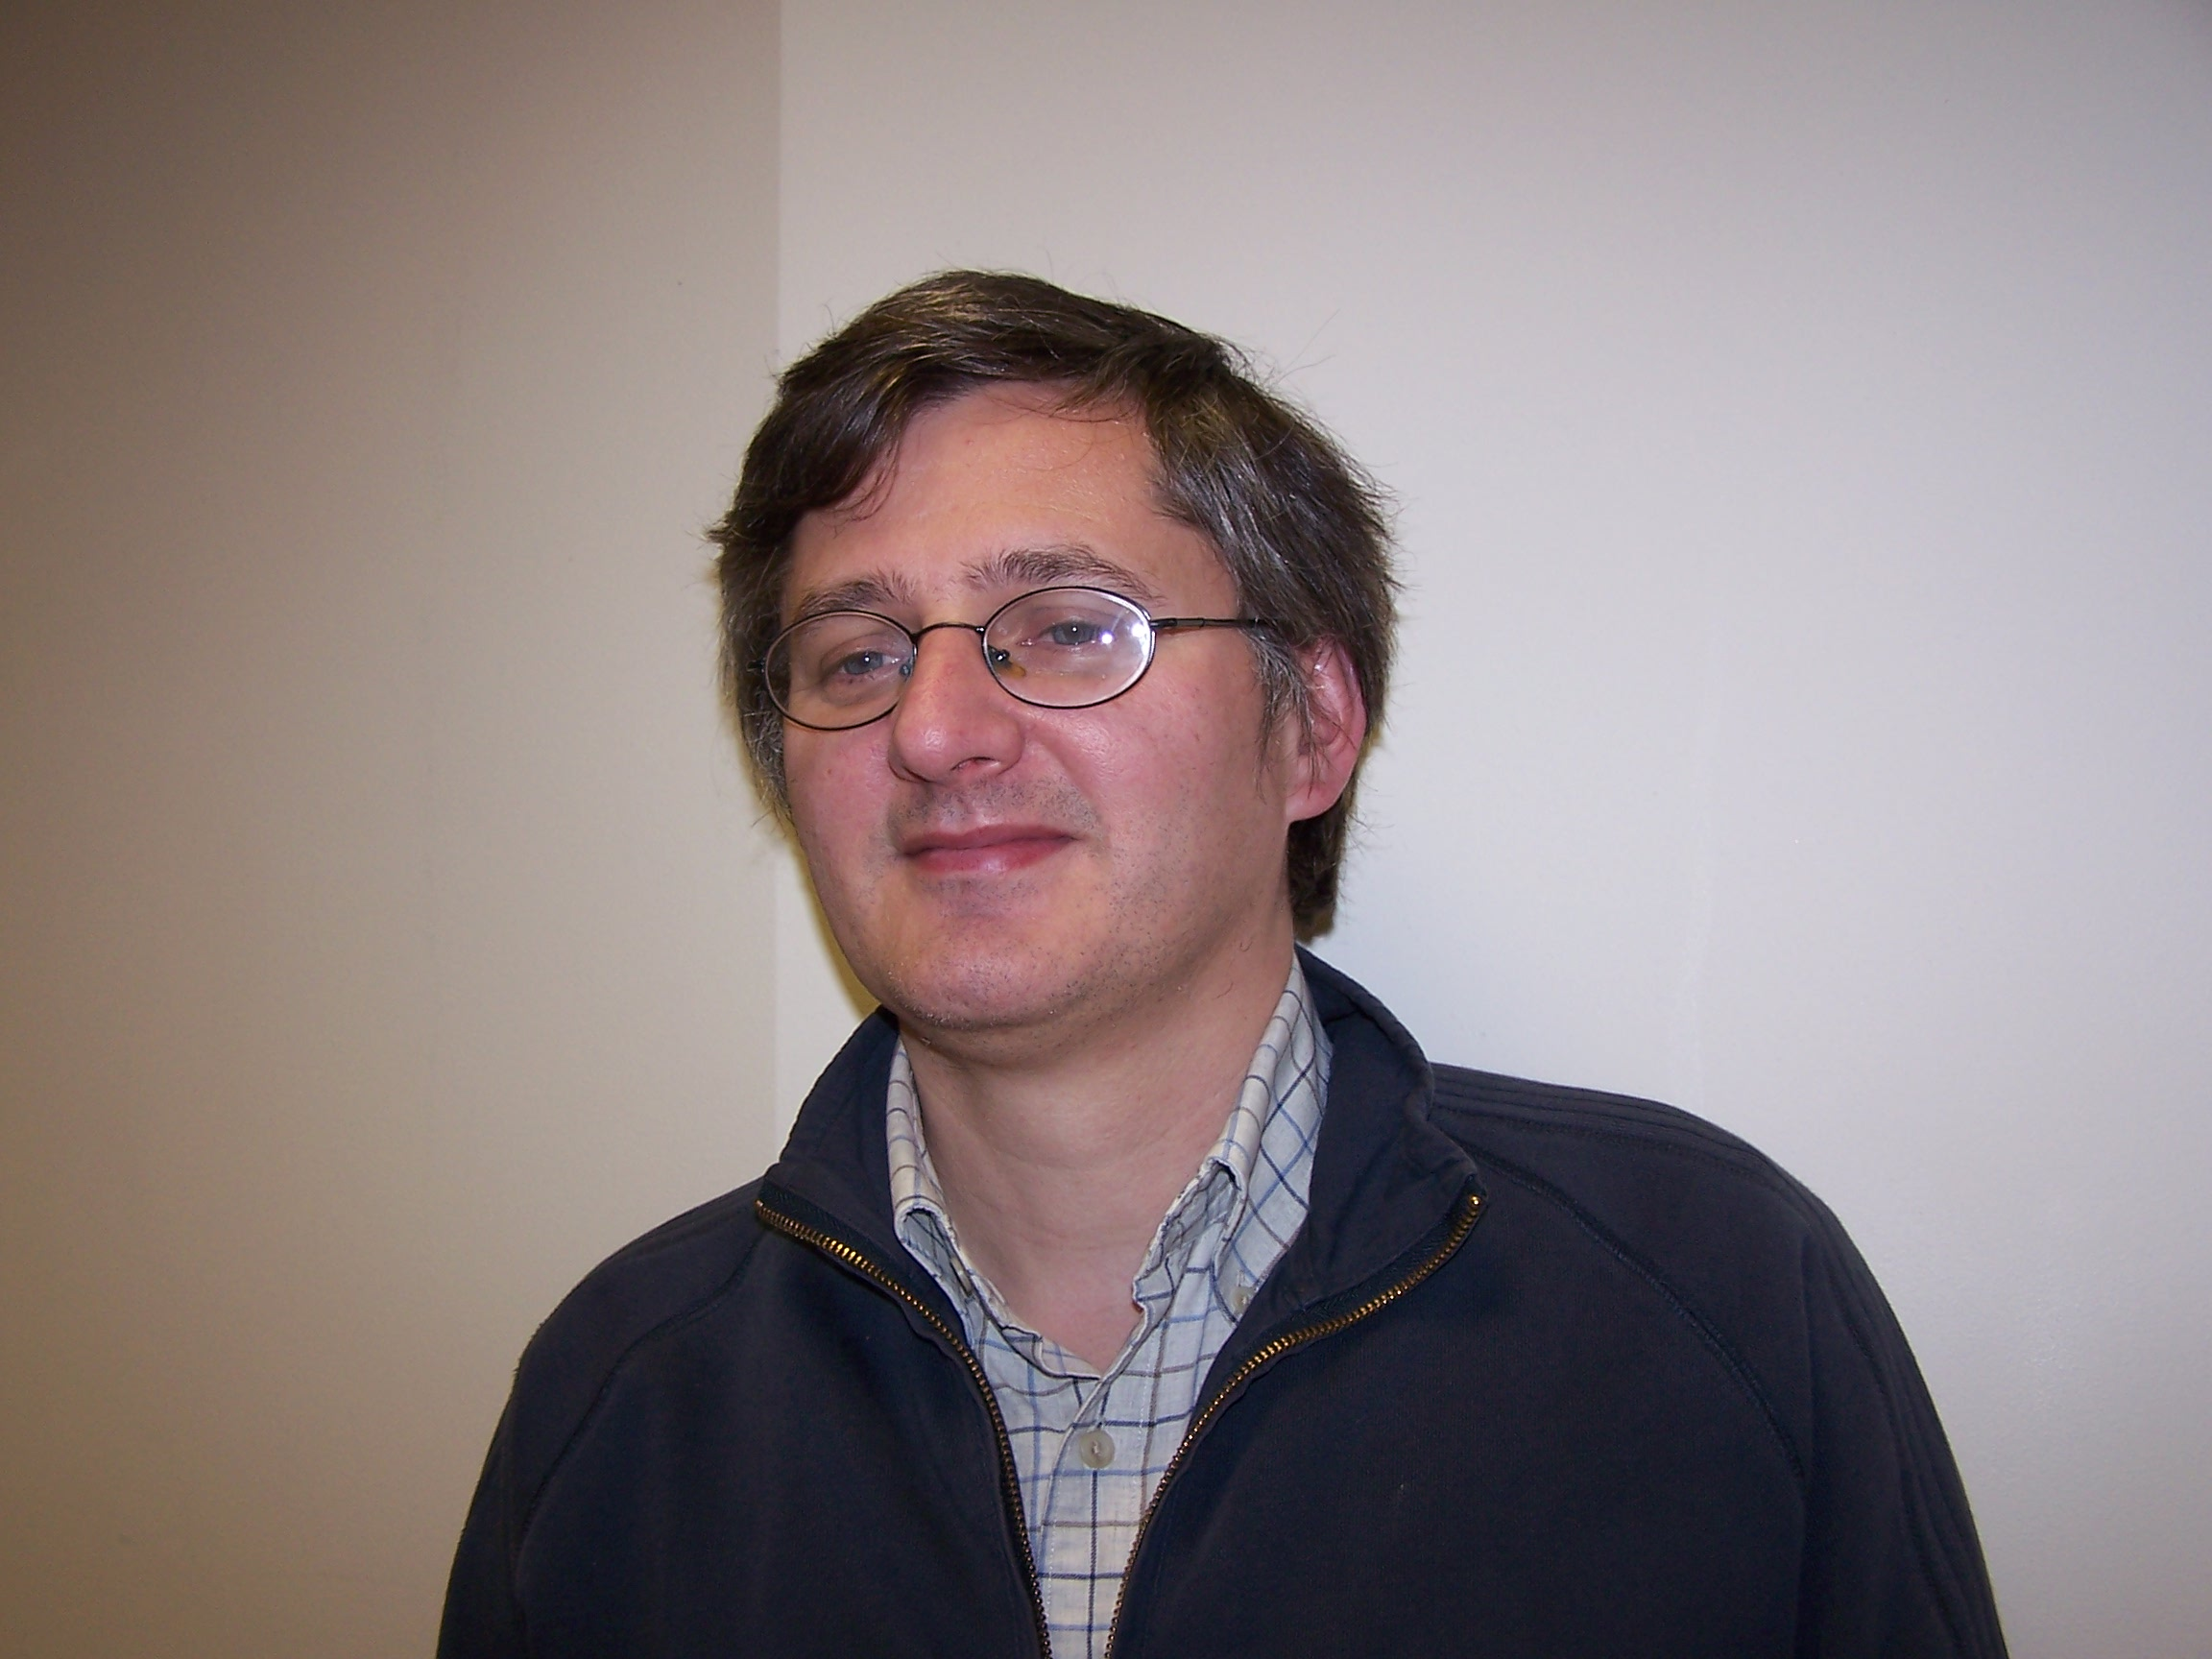 Chris Olley